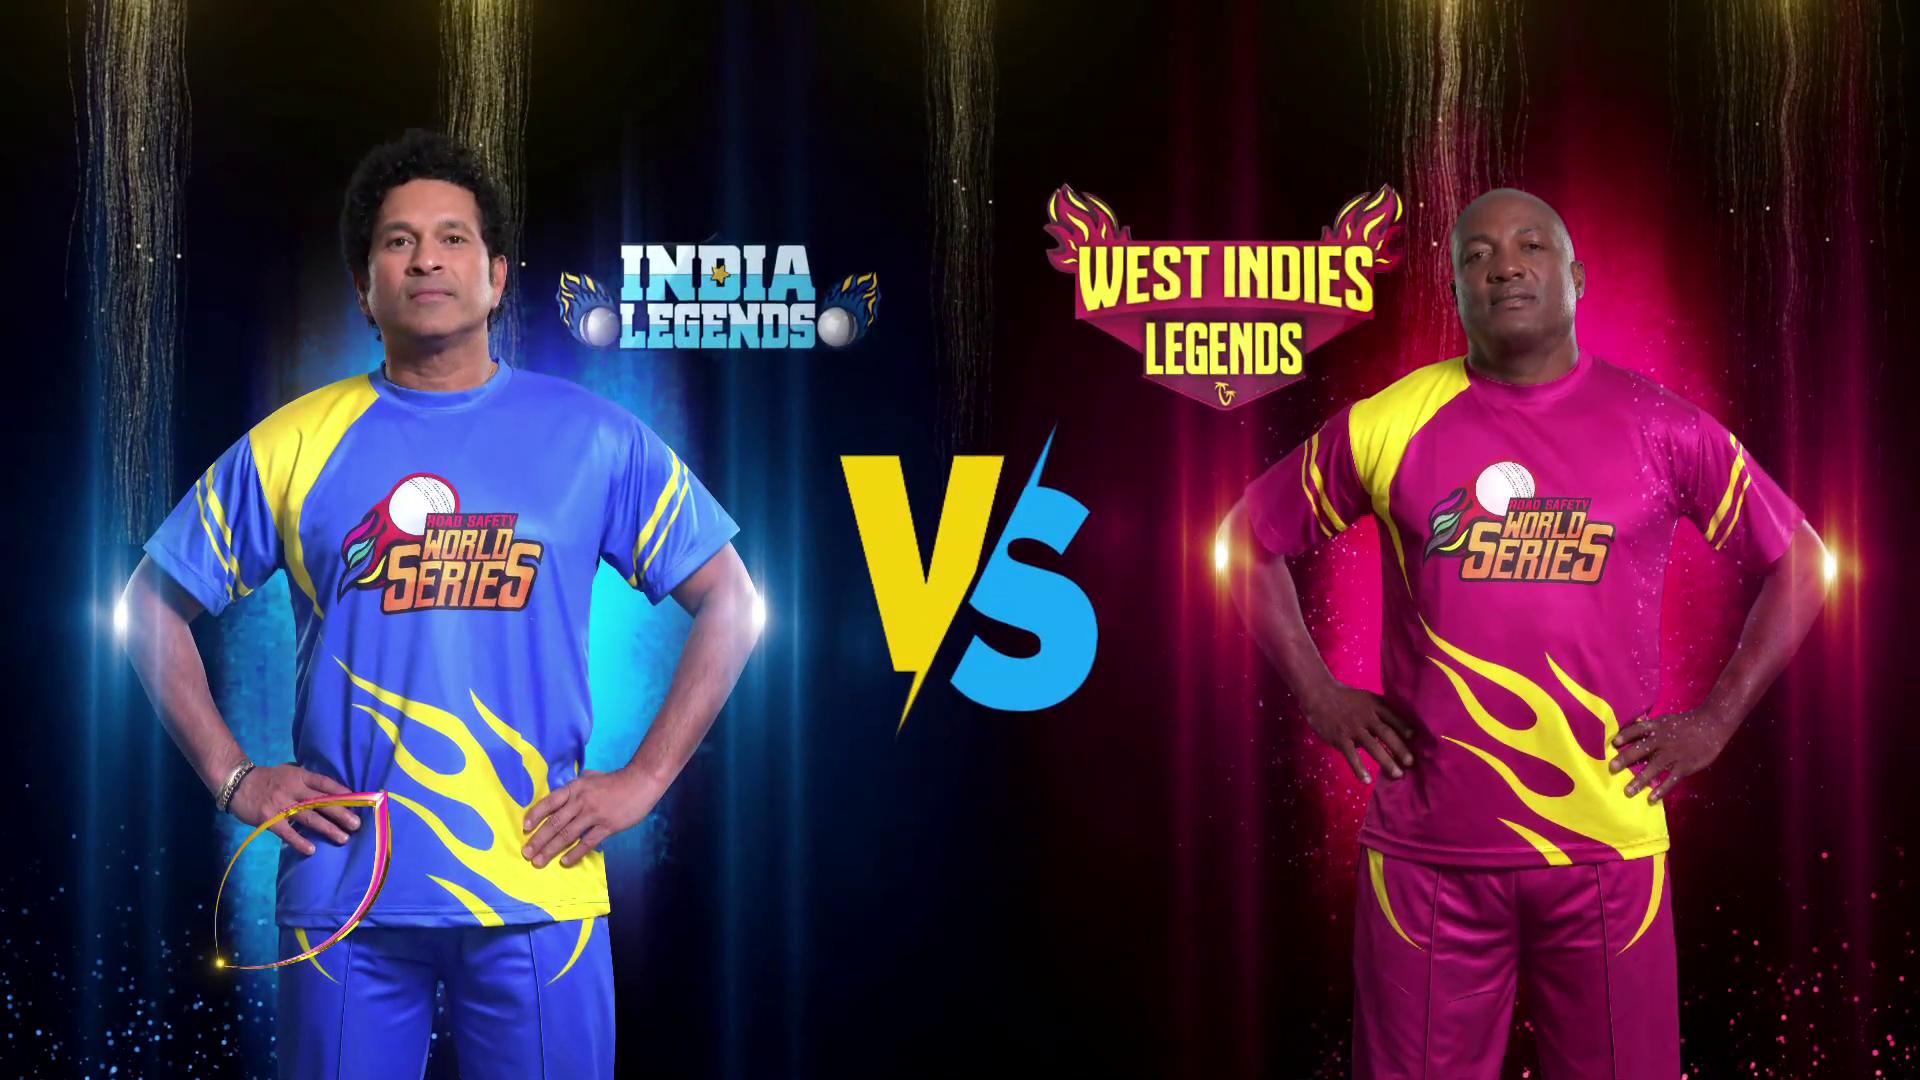 Start ho rahi hai Cricket Ki Sabse Badi Rivalry Sachin Vs Lara Ke beech, Road Safety World Series 7th March Se Live